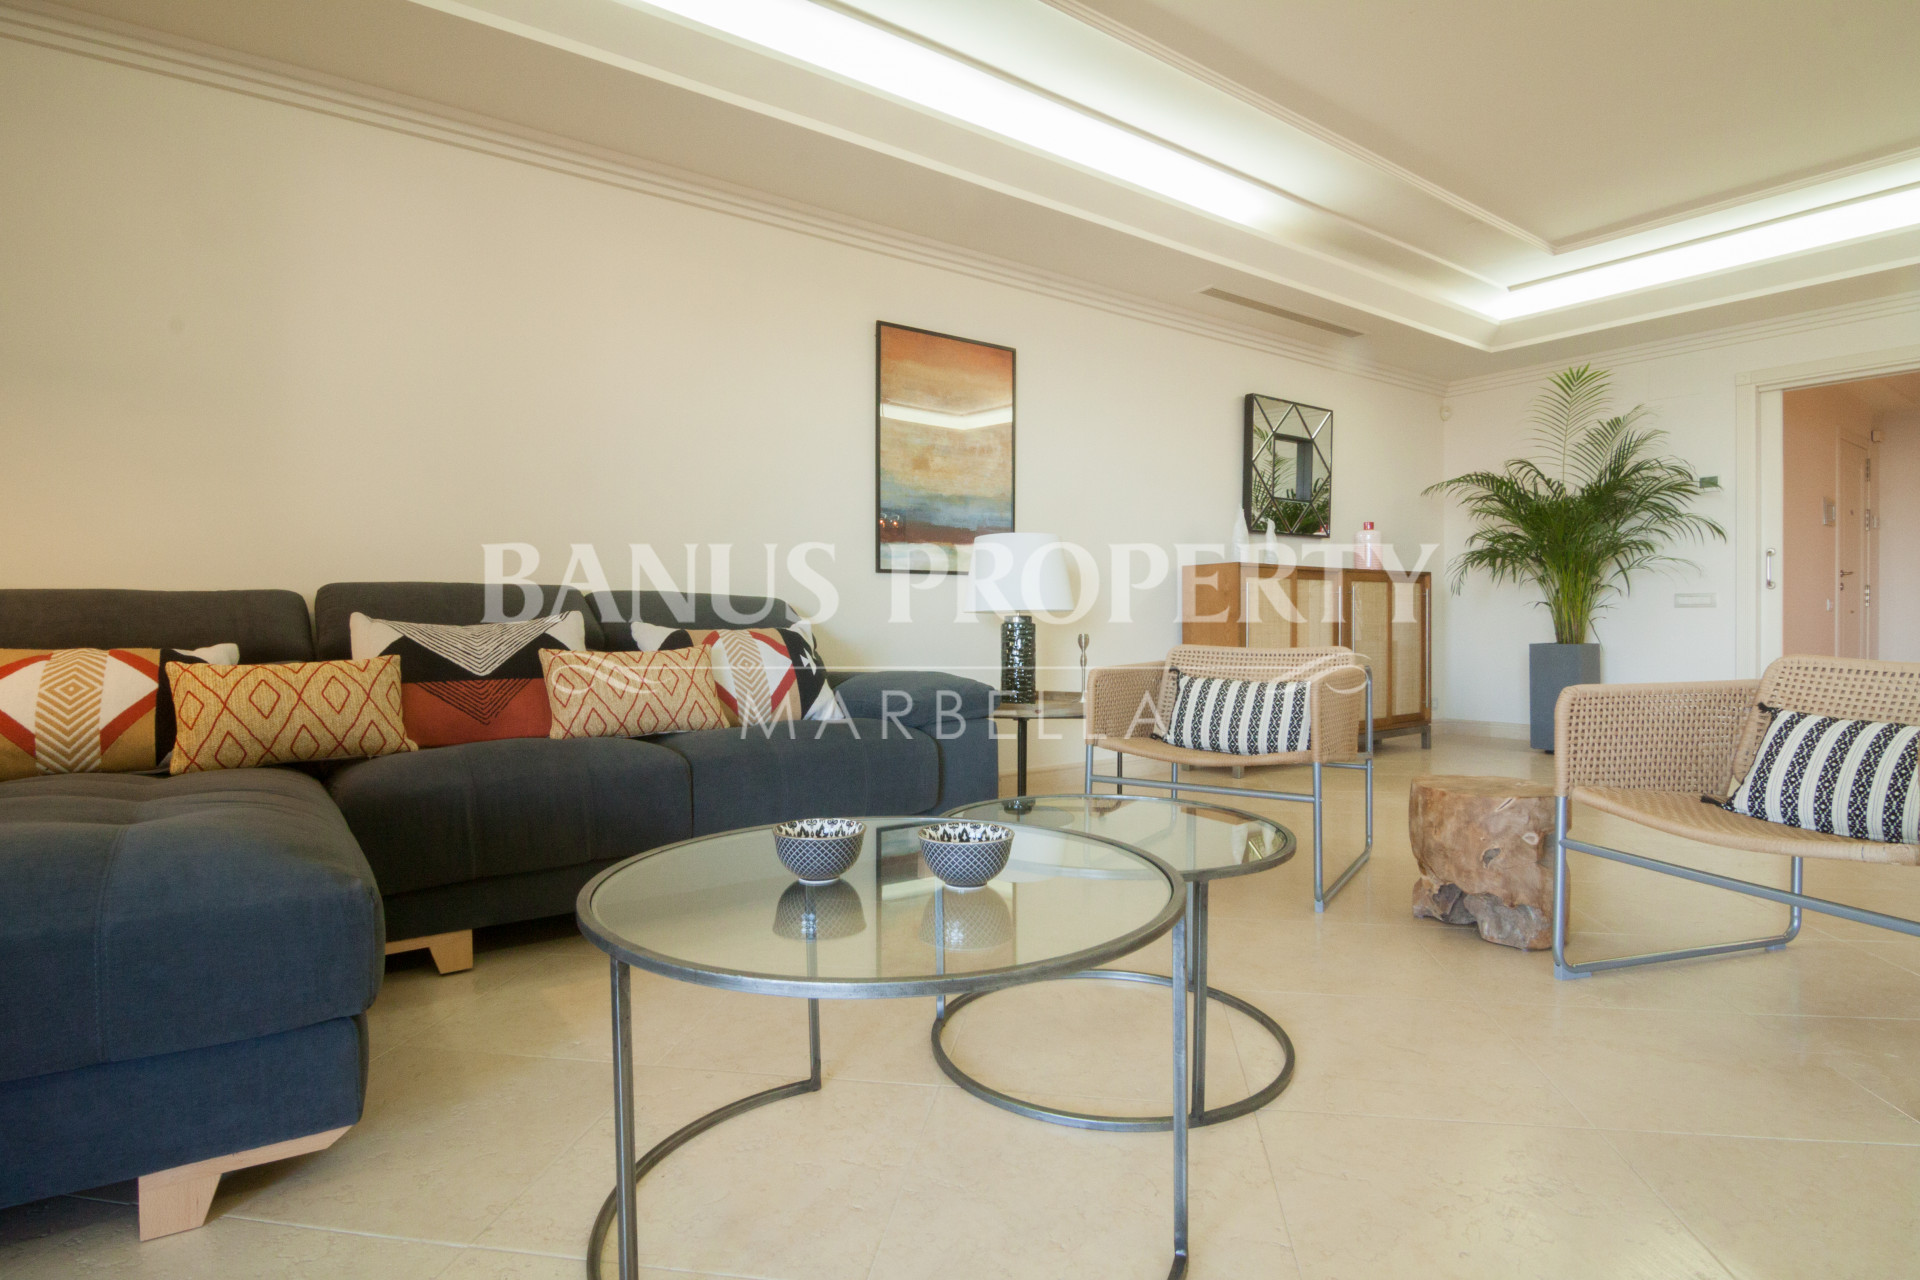 Modern three-bedroom beachfront apartment for rent in Los Granados del Mar.